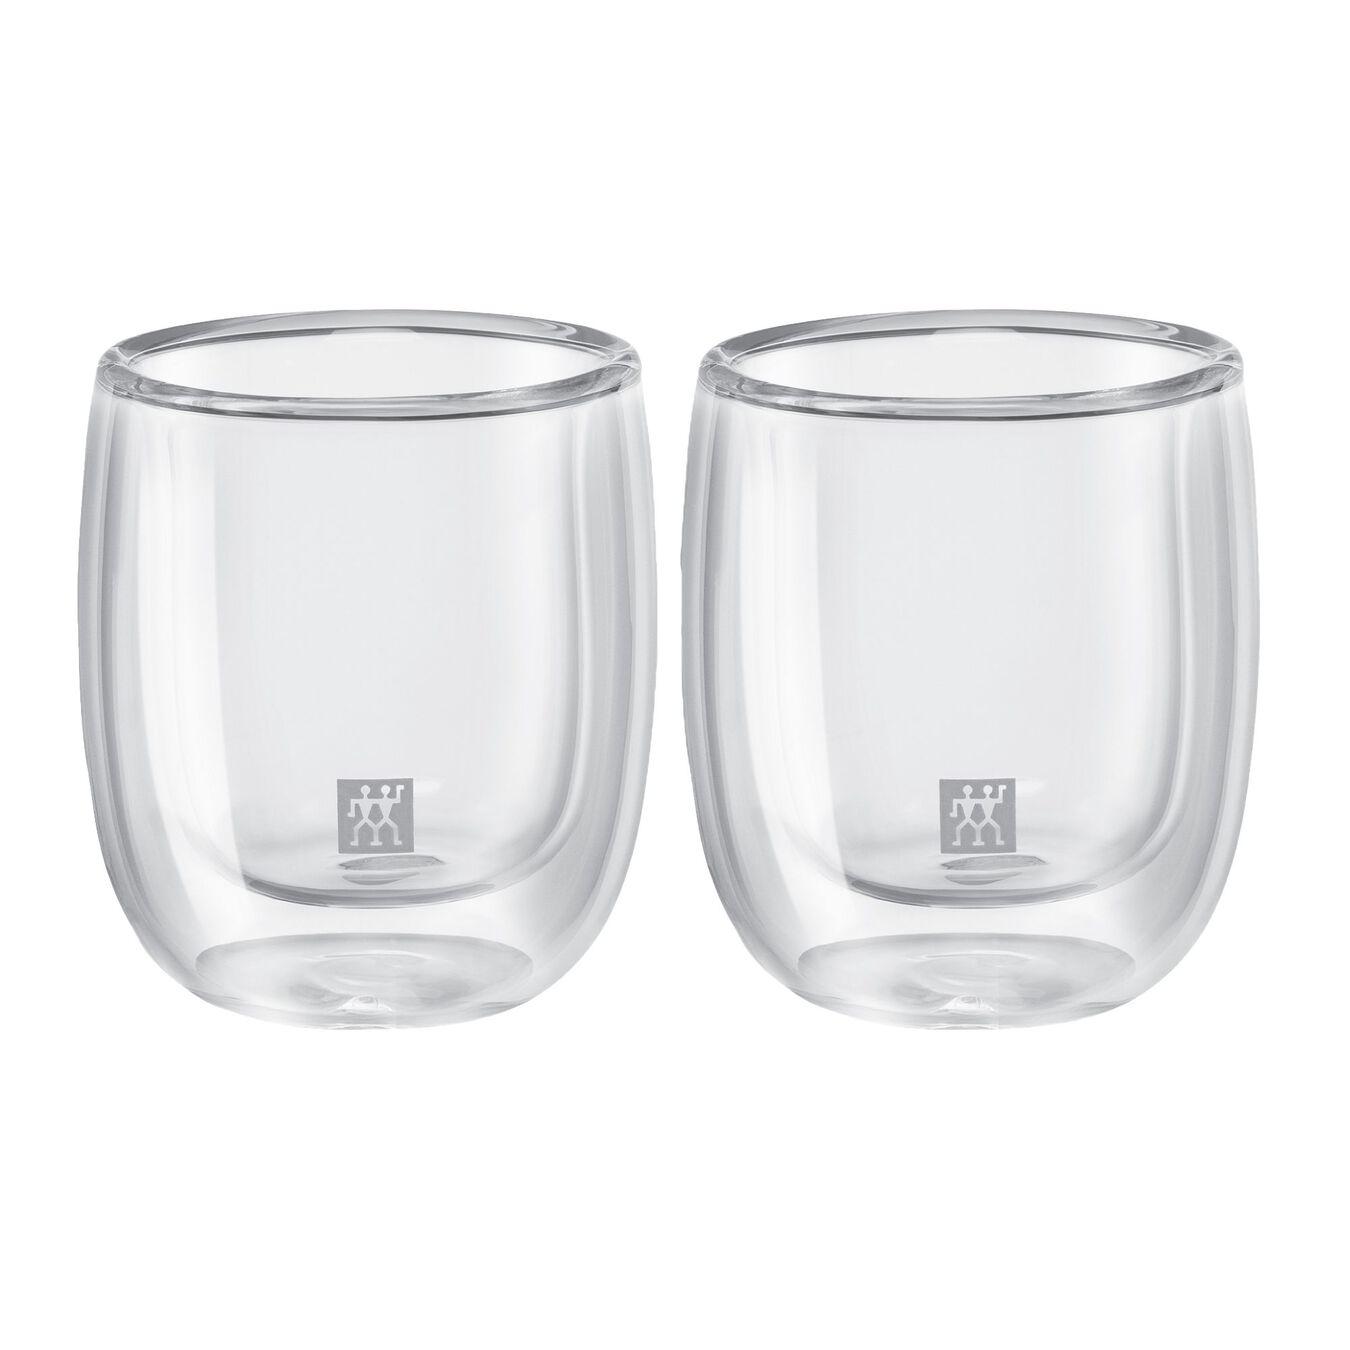 Çift Camlı Espresso bardağı seti, 2-parça,,large 1